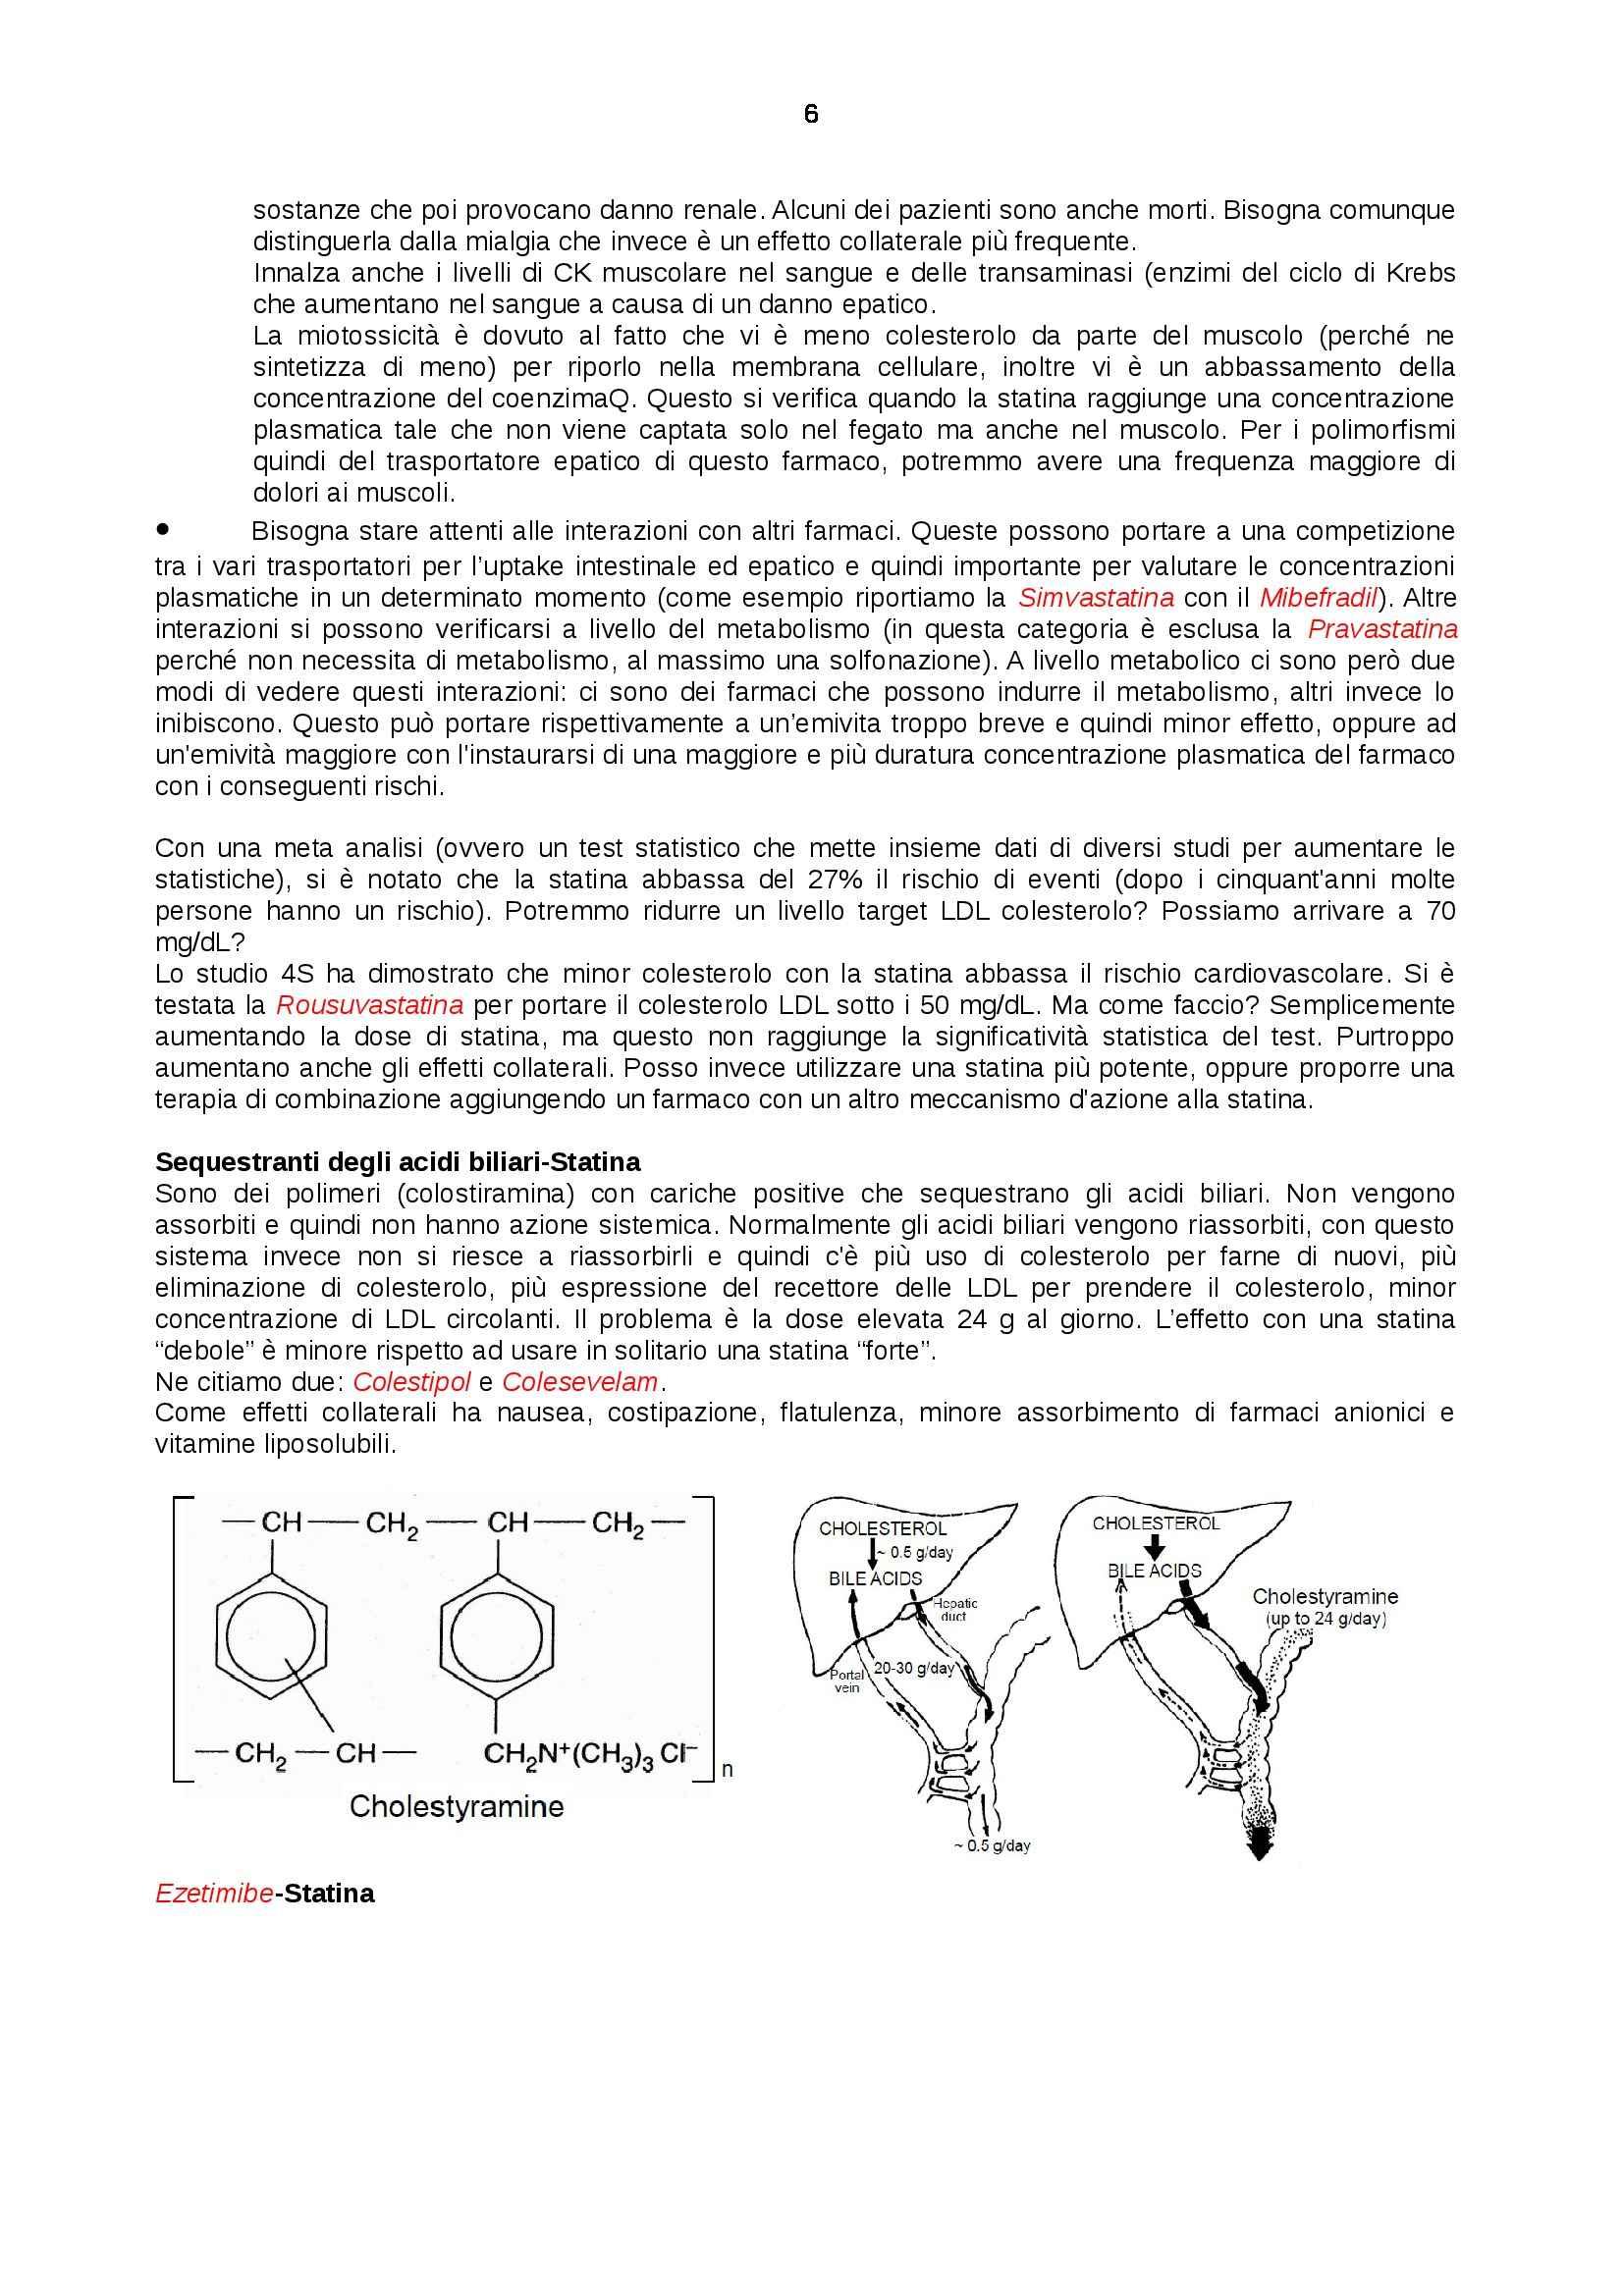 Farmacologia - dislipidemie, colesterolo, statine Pag. 6